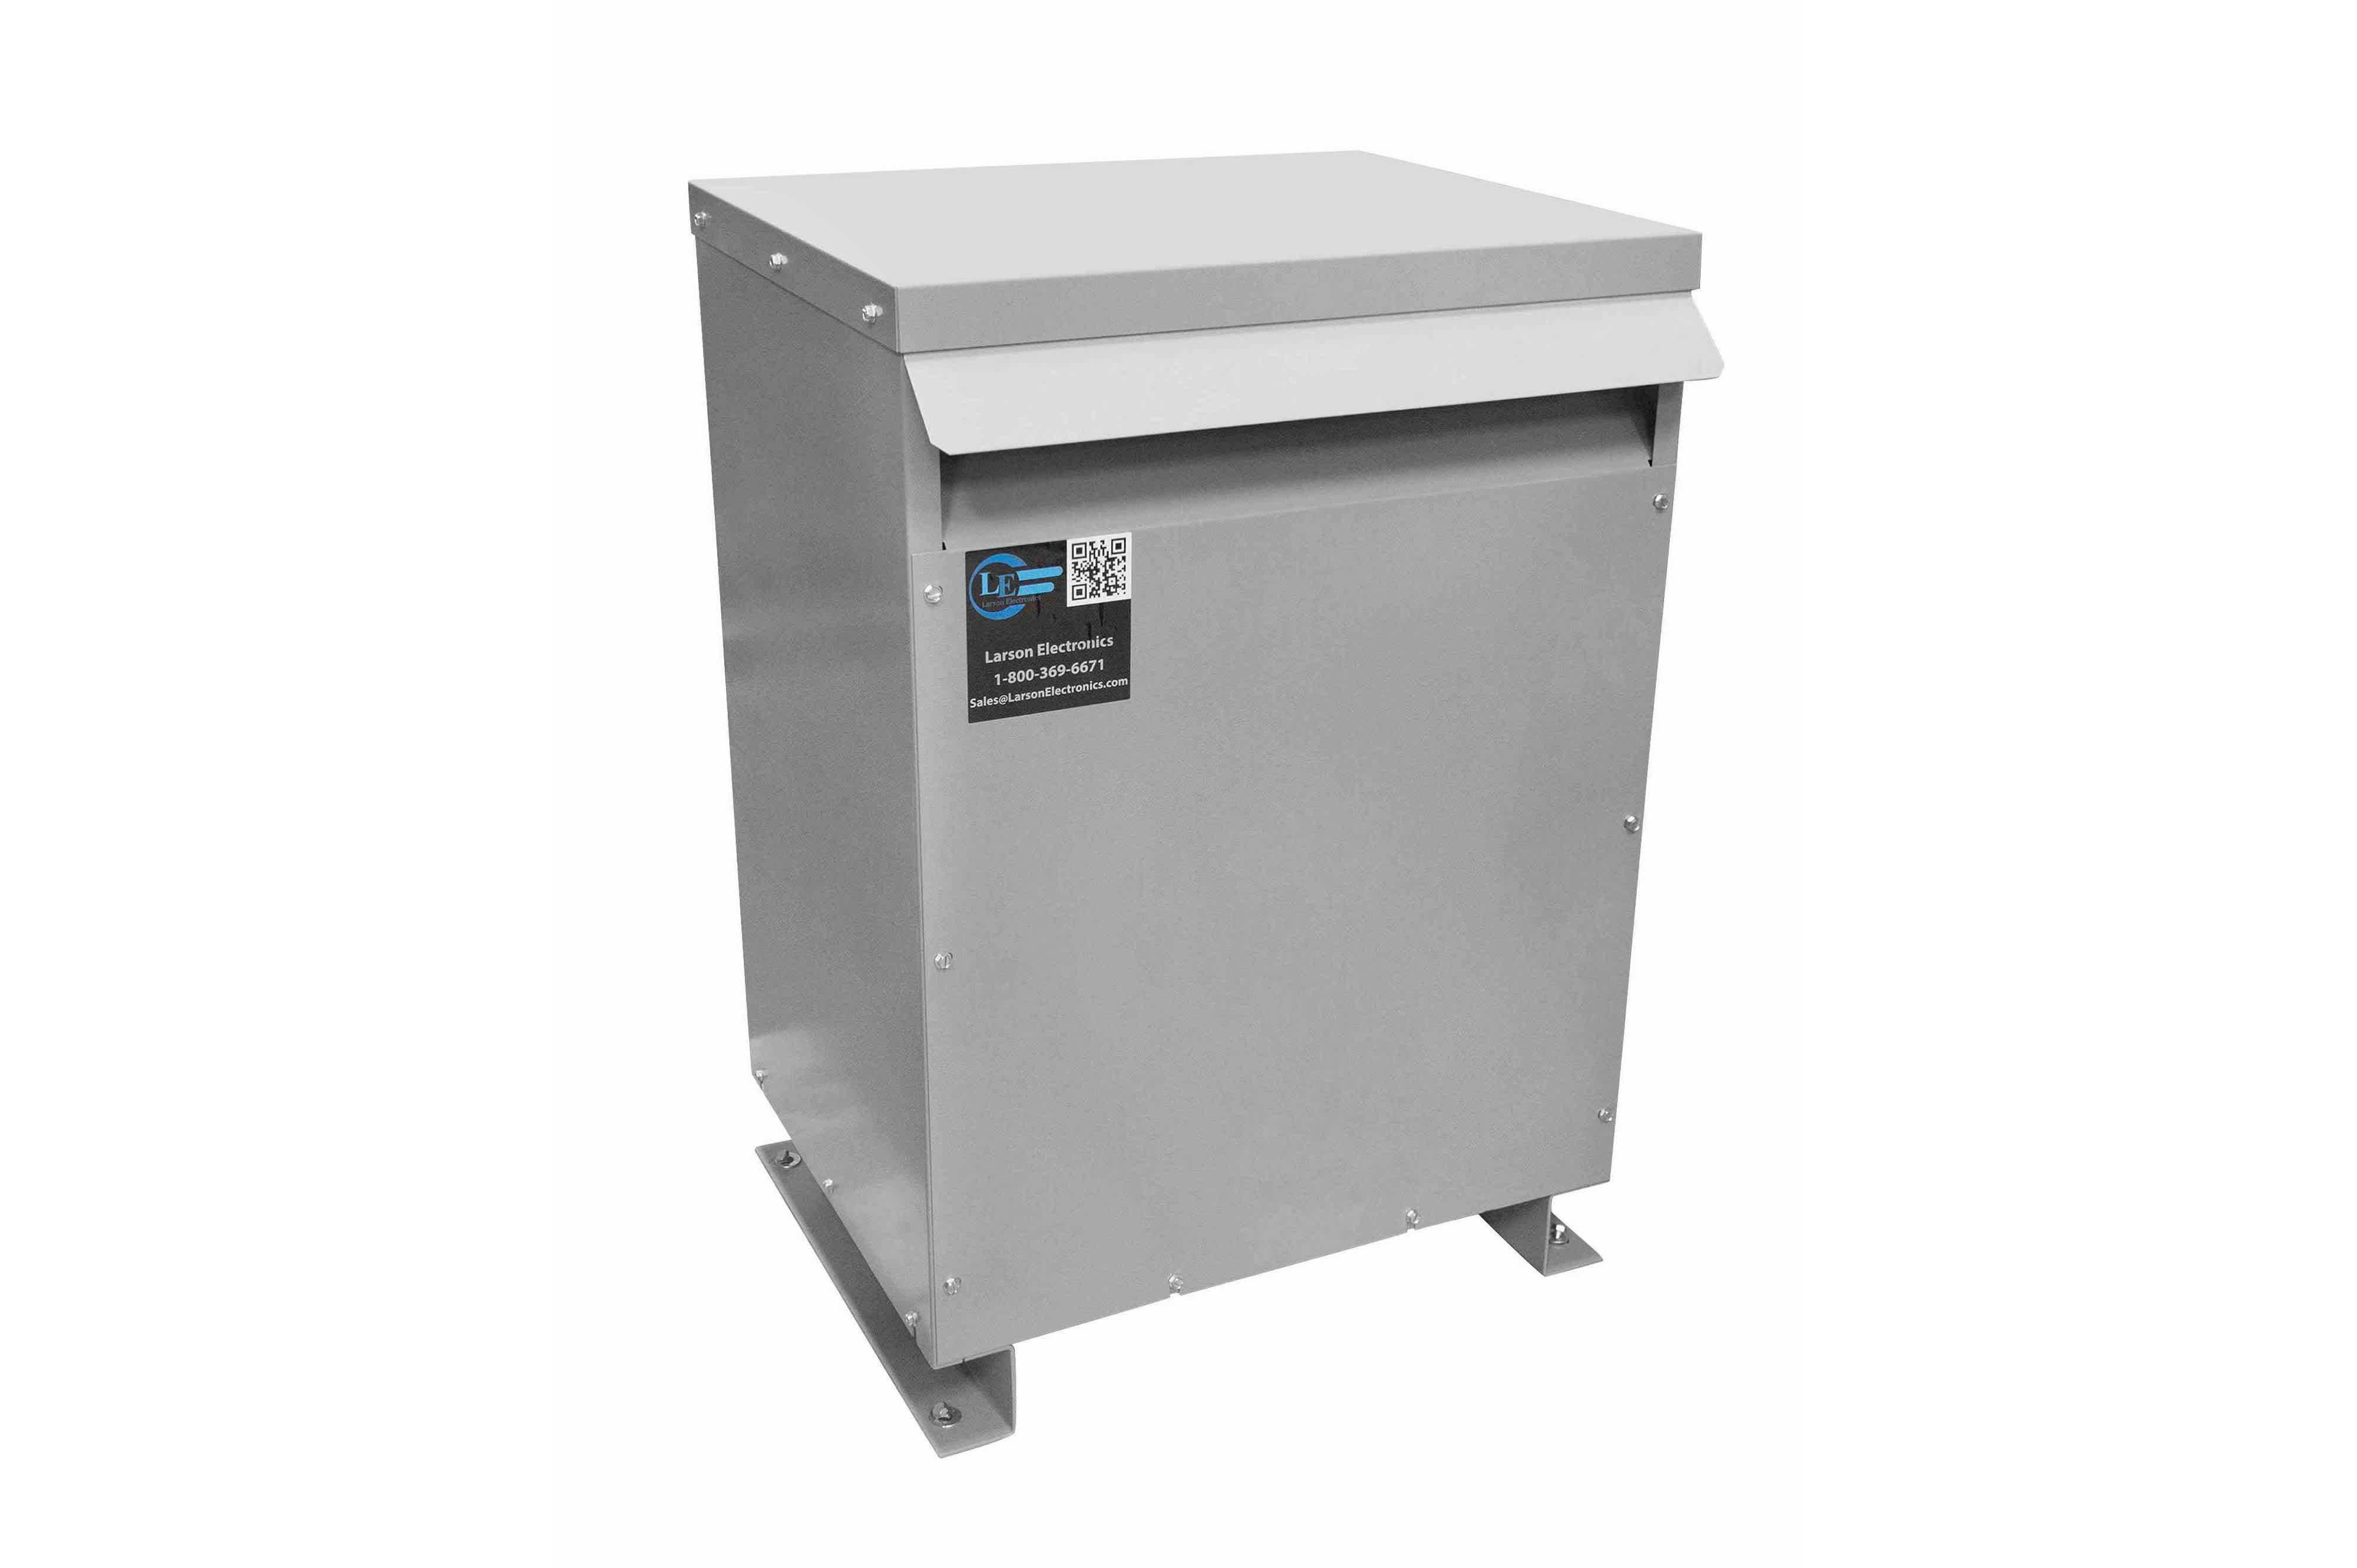 60 kVA 3PH Isolation Transformer, 440V Wye Primary, 208Y/120 Wye-N Secondary, N3R, Ventilated, 60 Hz